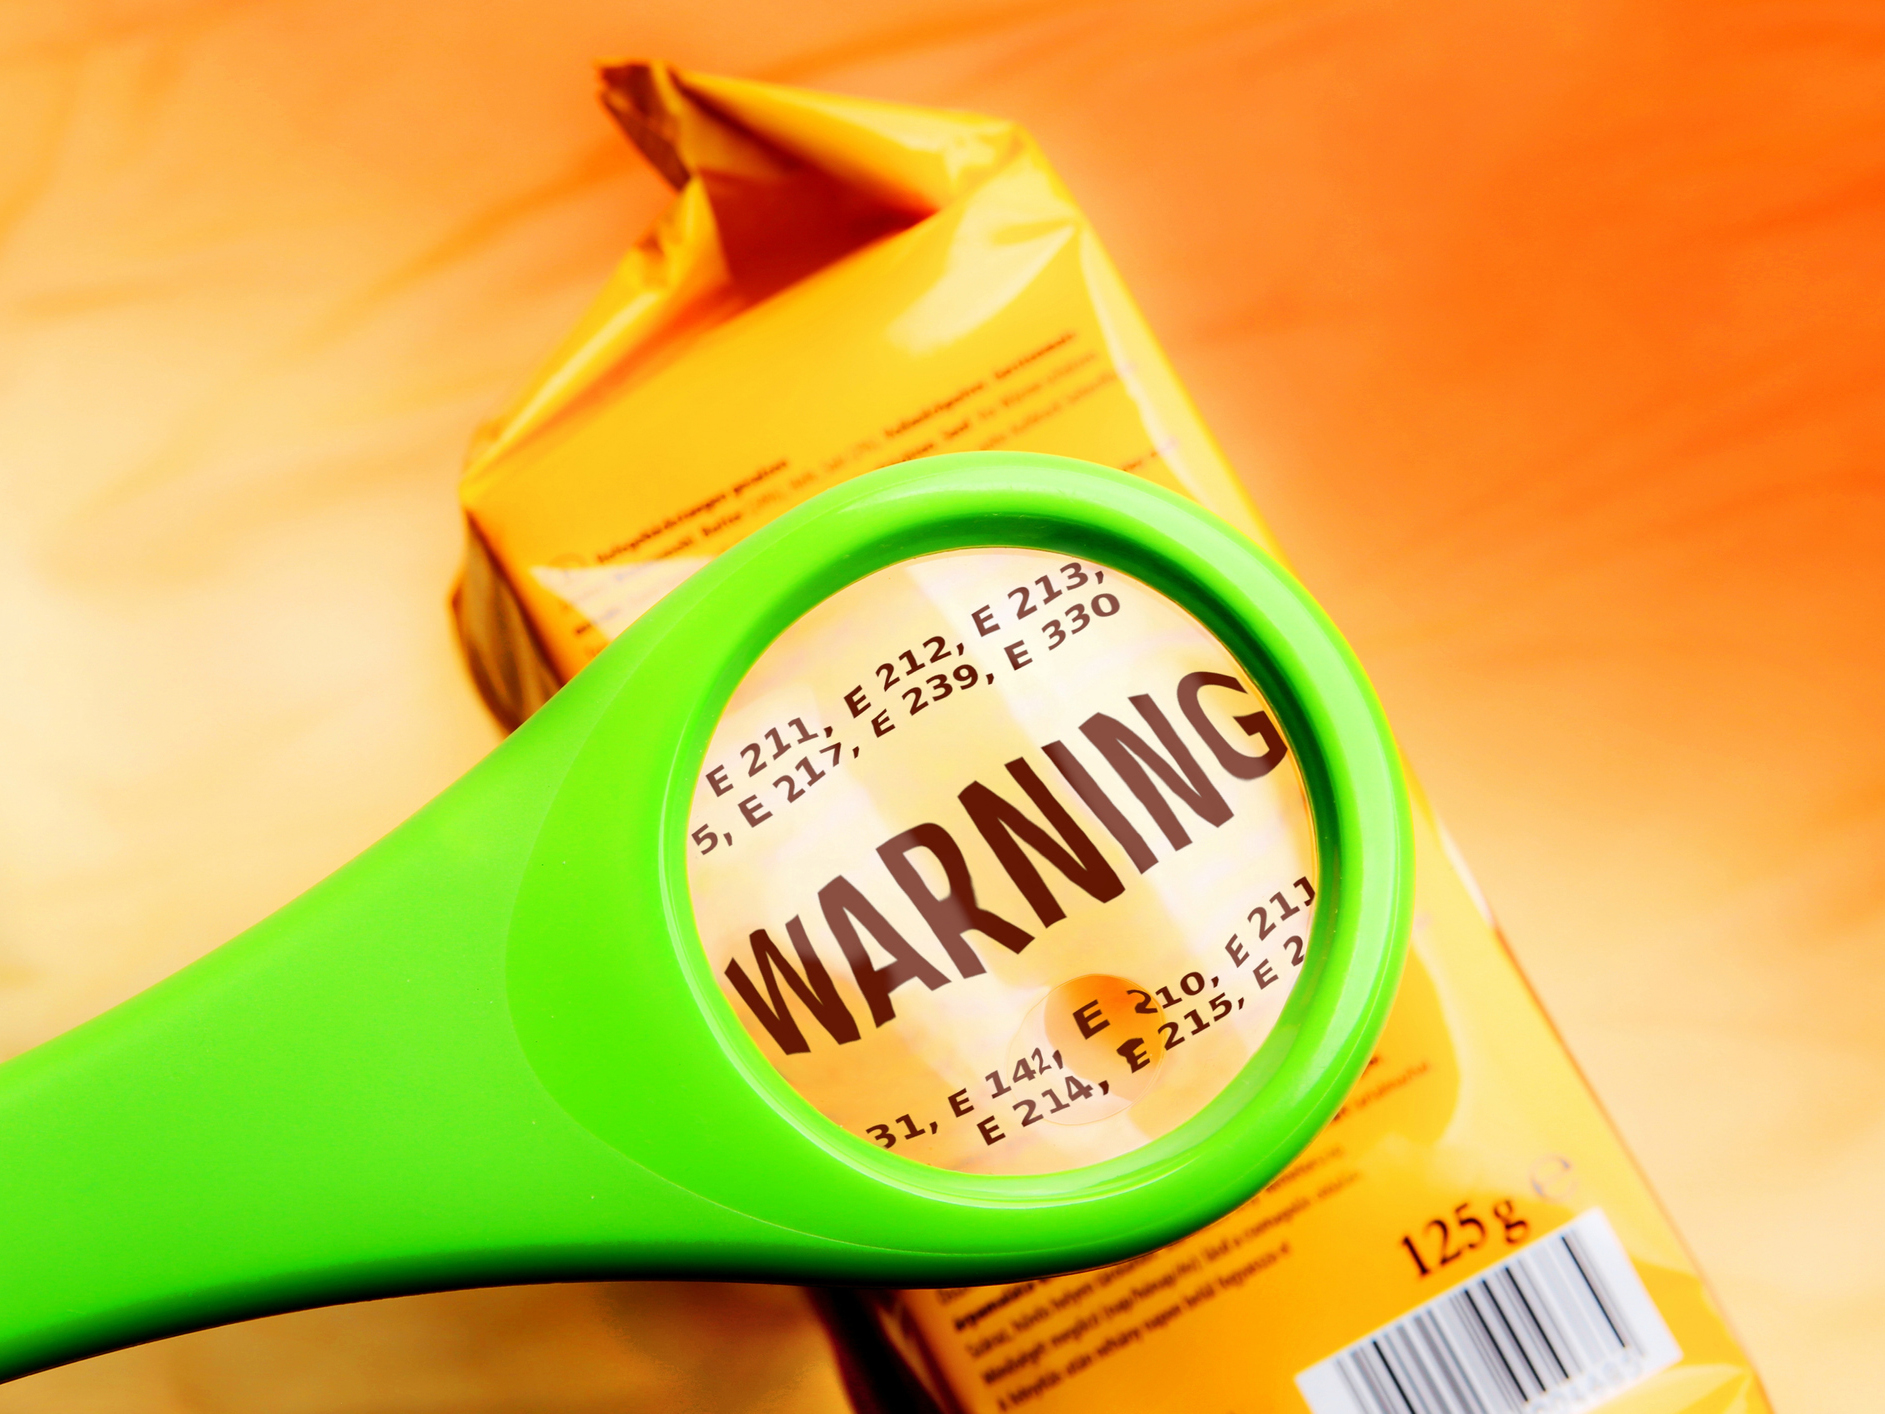 This immune-suppressing food additive makes fighting viruses harder